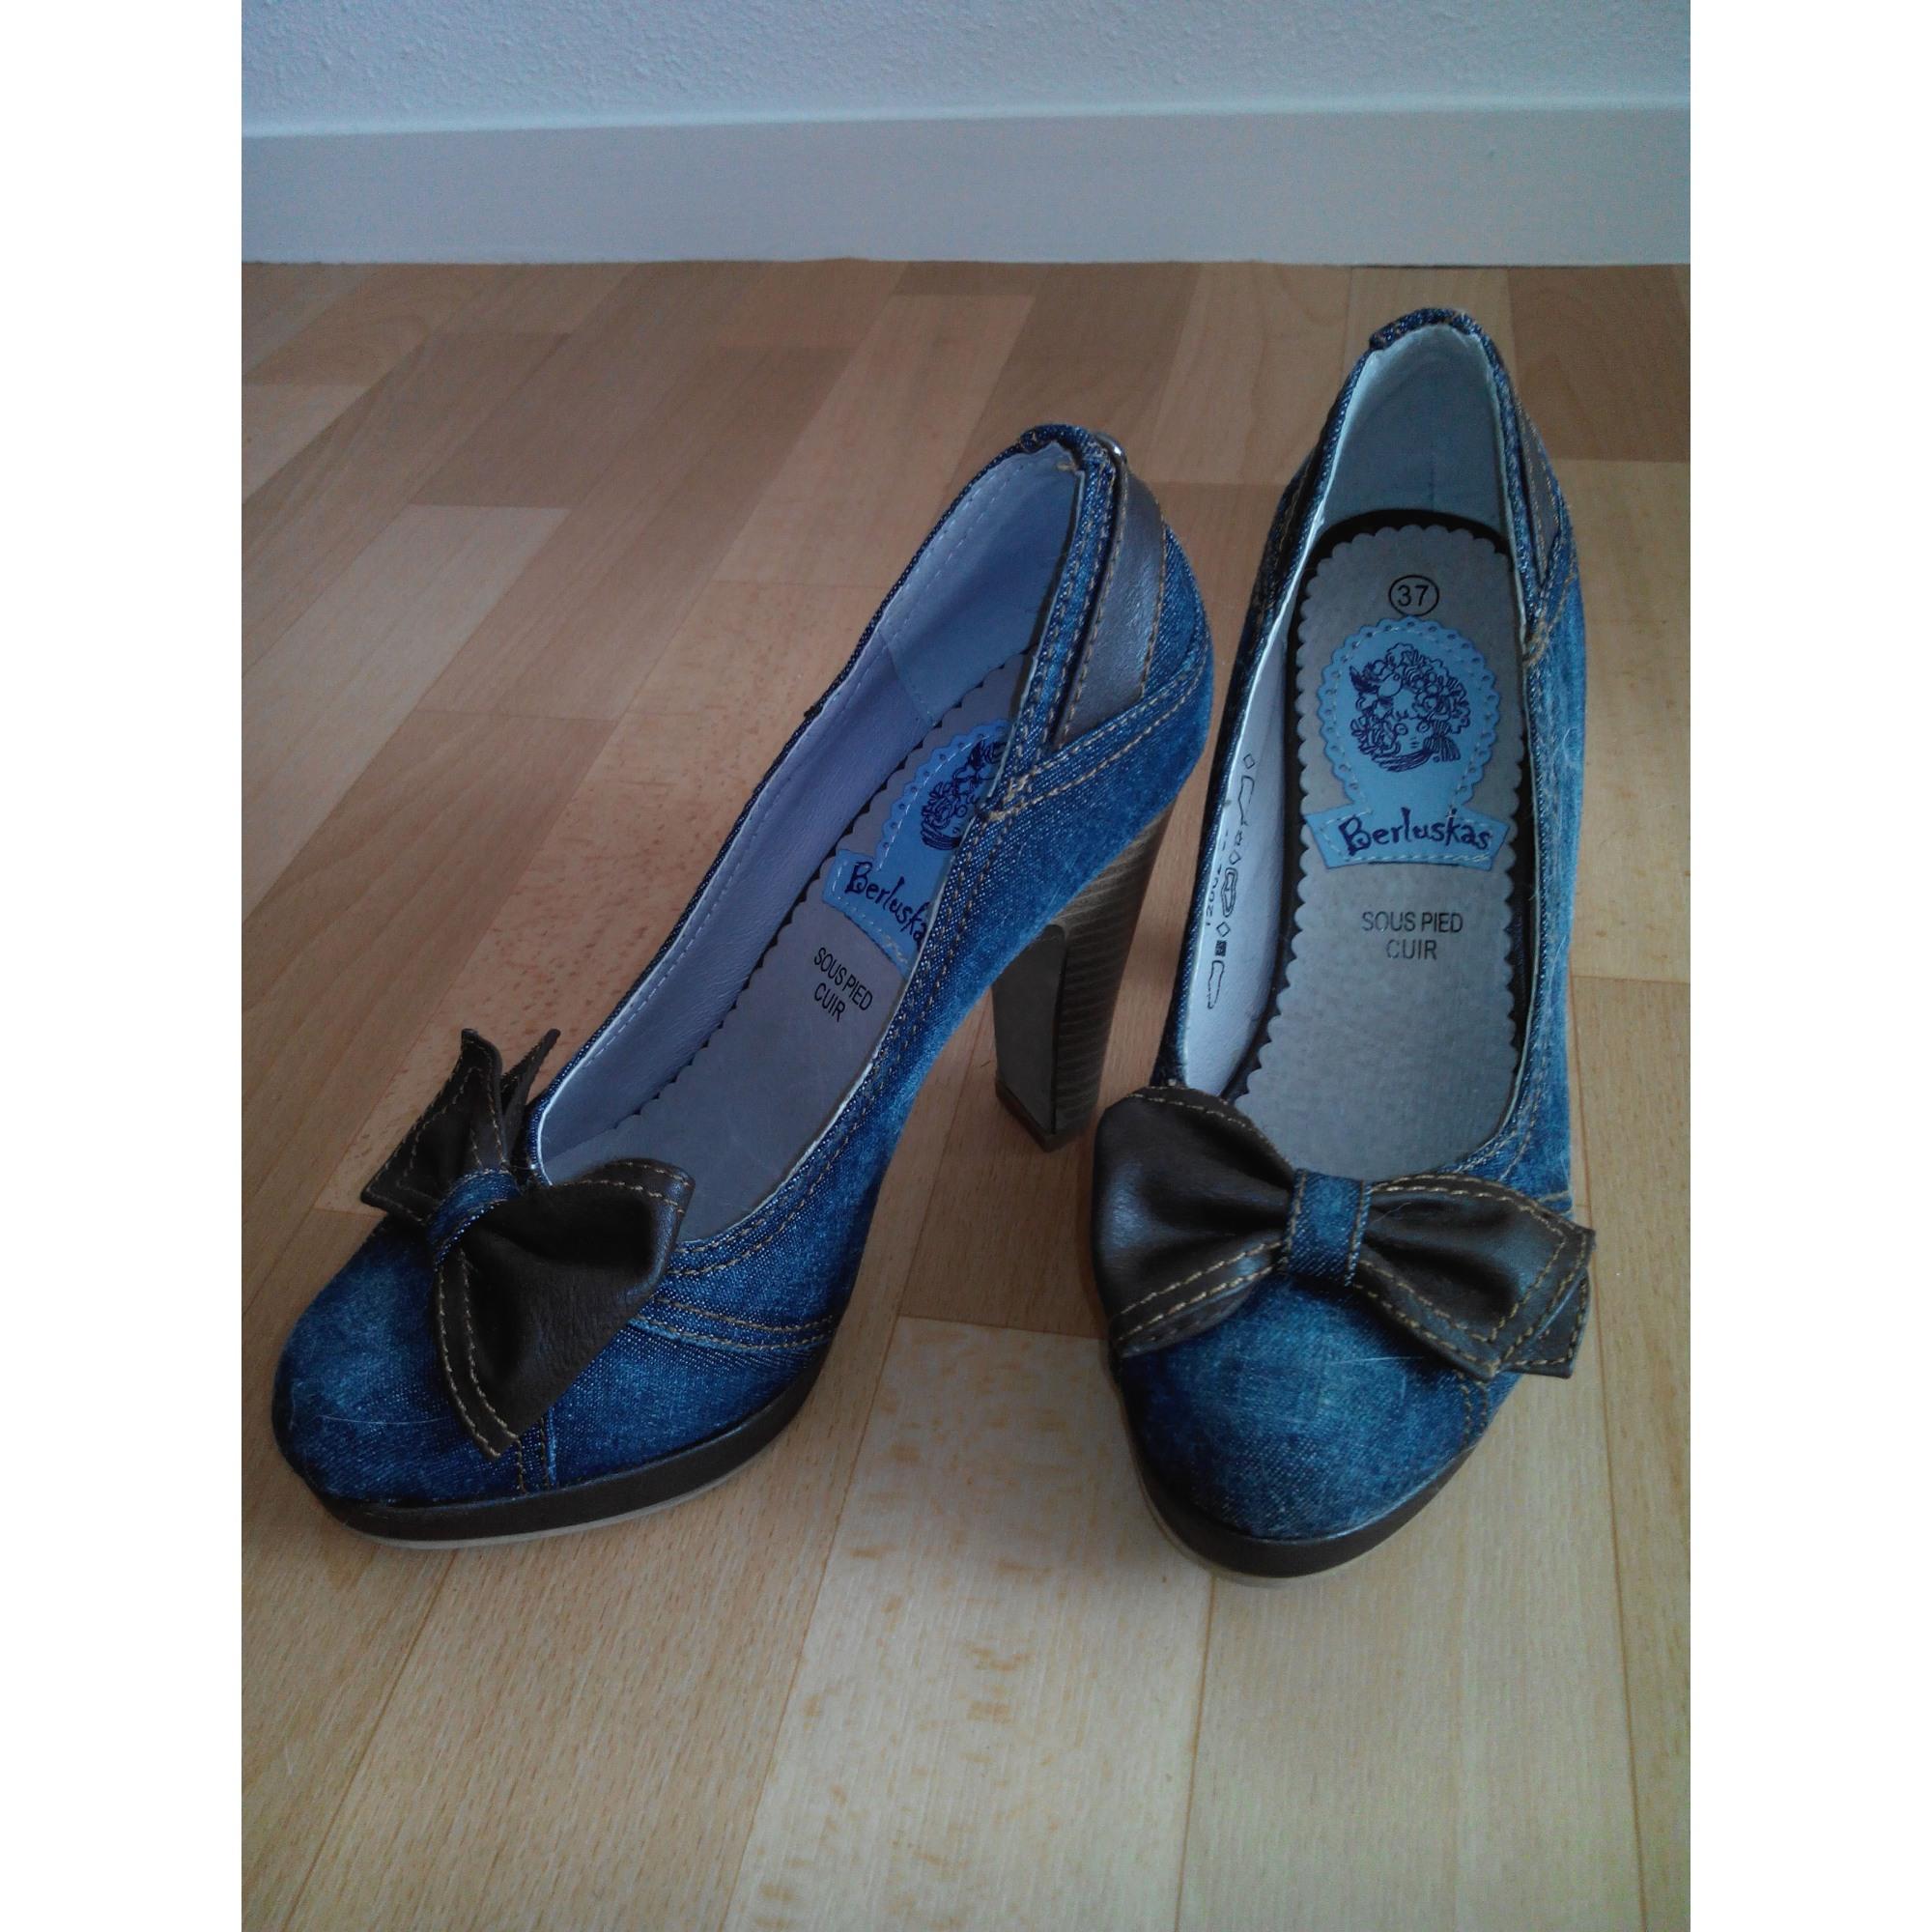 bleu Escarpins CHAUSSURES 37 BESSON 4033796 txtOYqRH